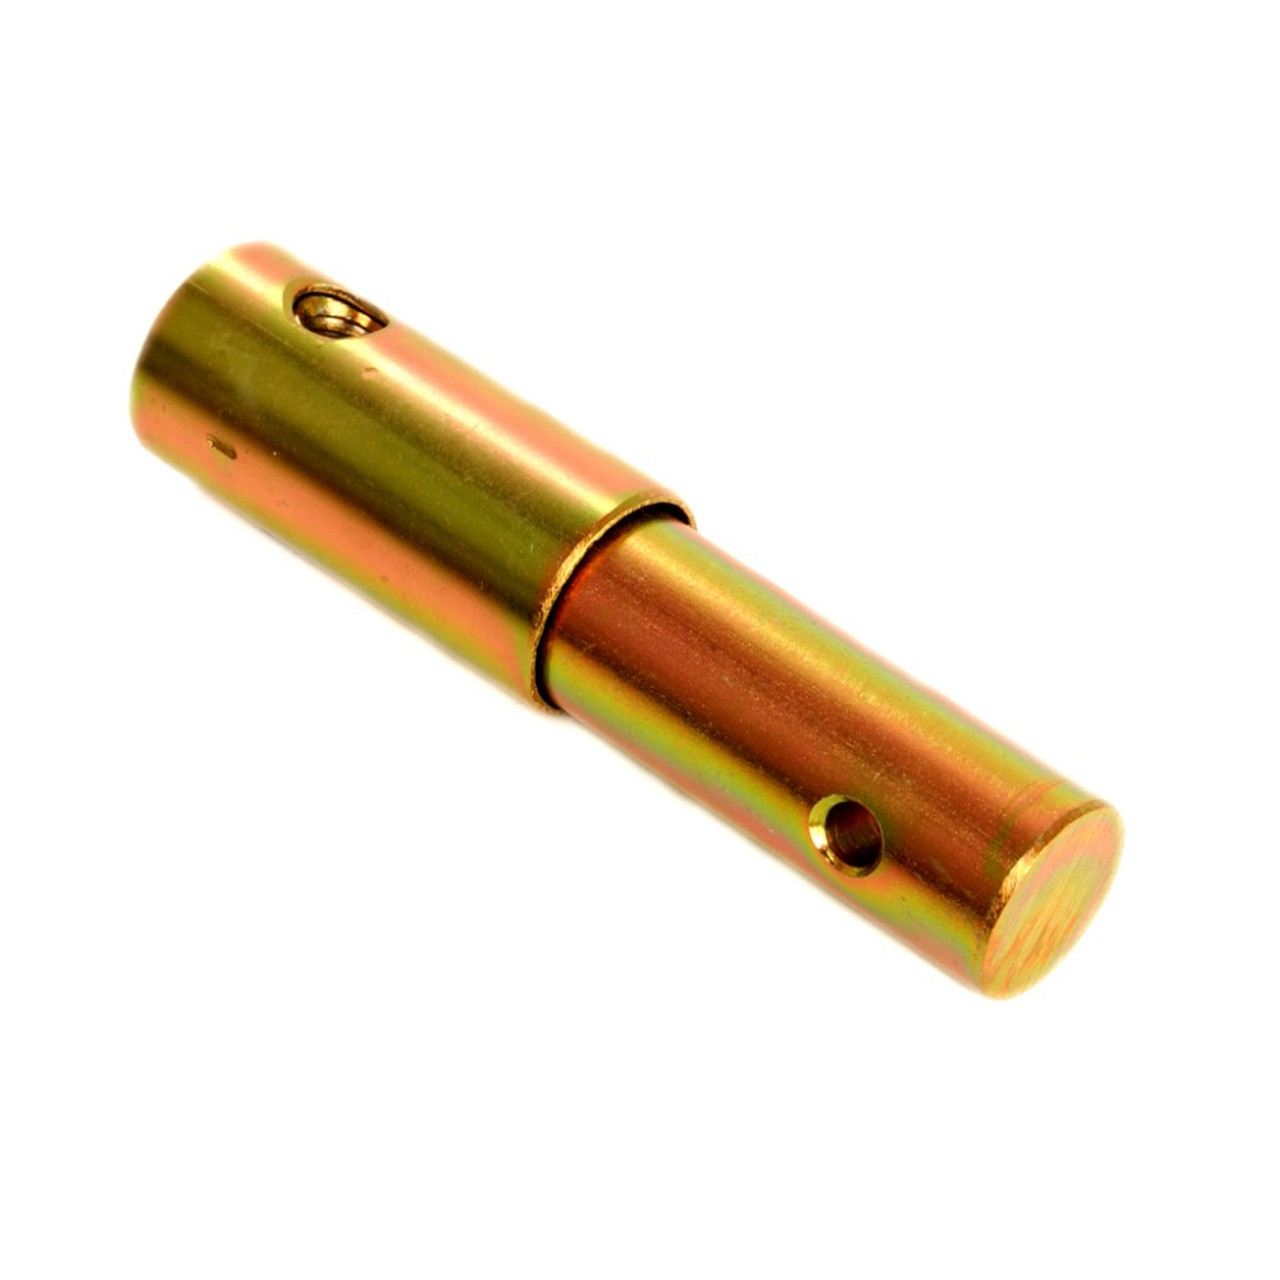 Pit Bull Standard Pin plus #1 Adapter